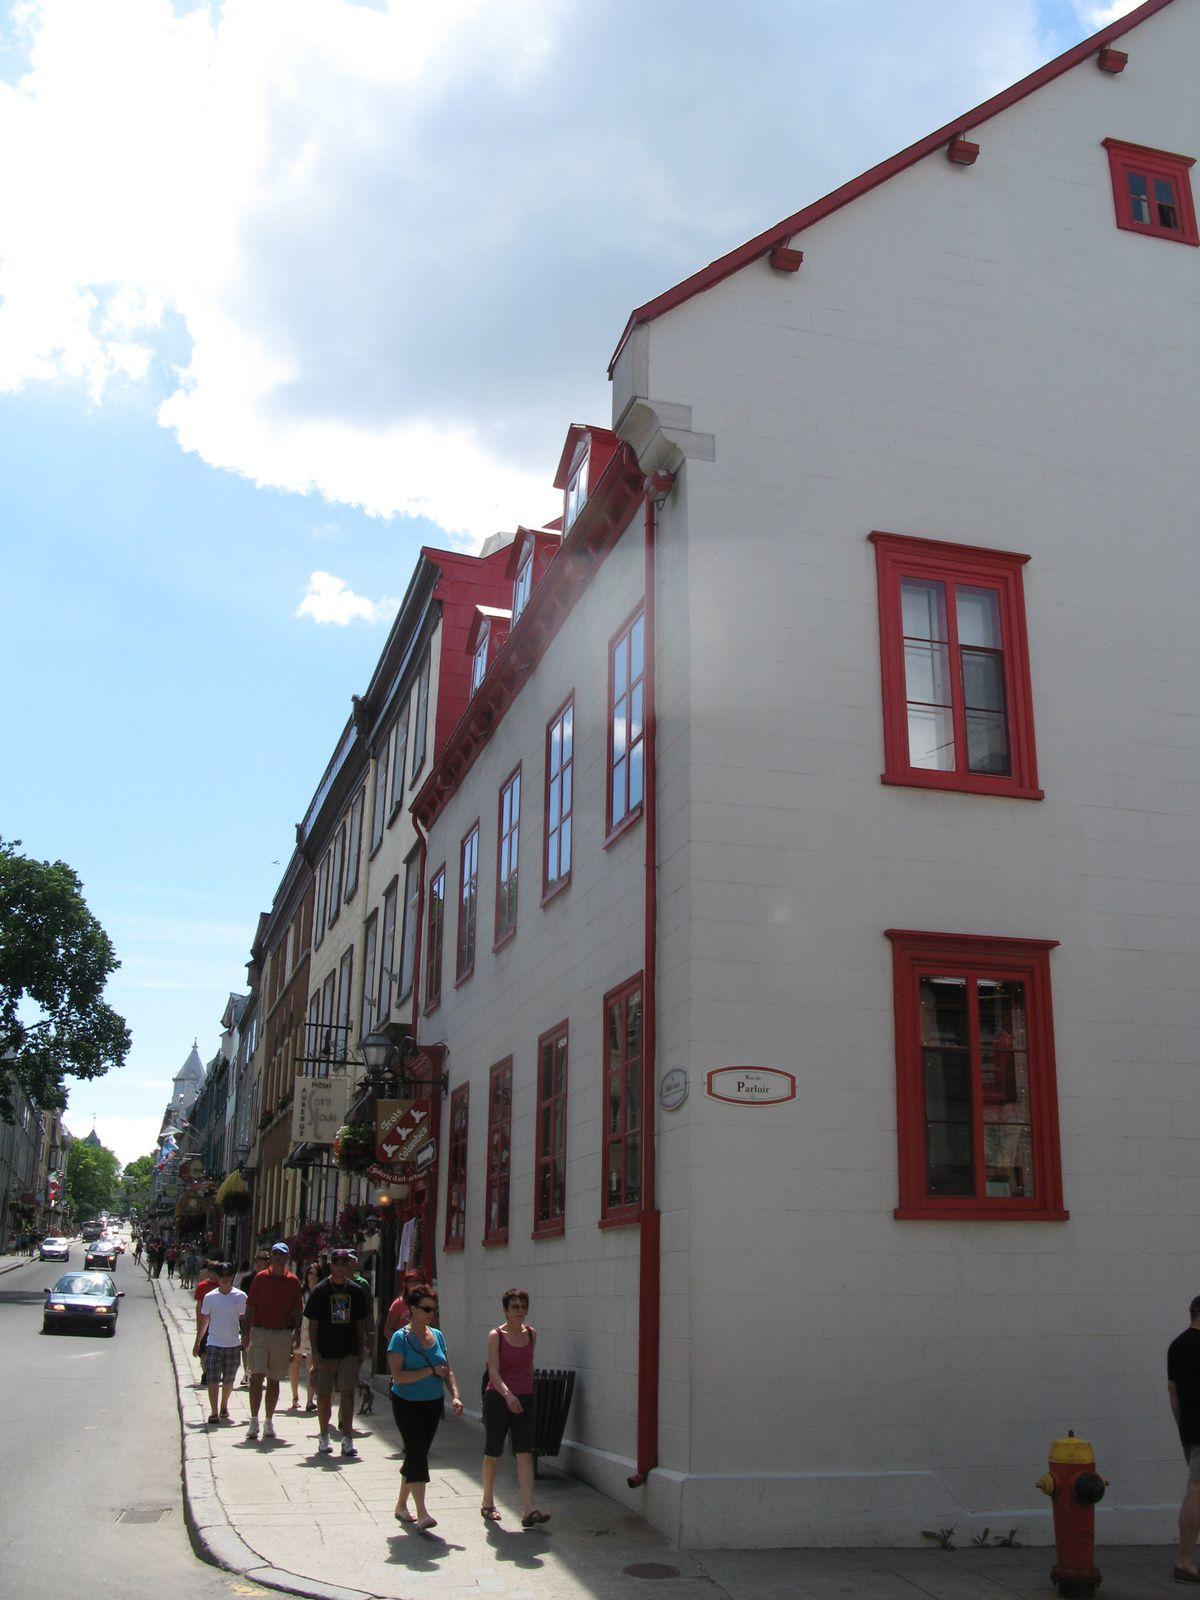 rue de la ville de quebec sur charlotteblablablog